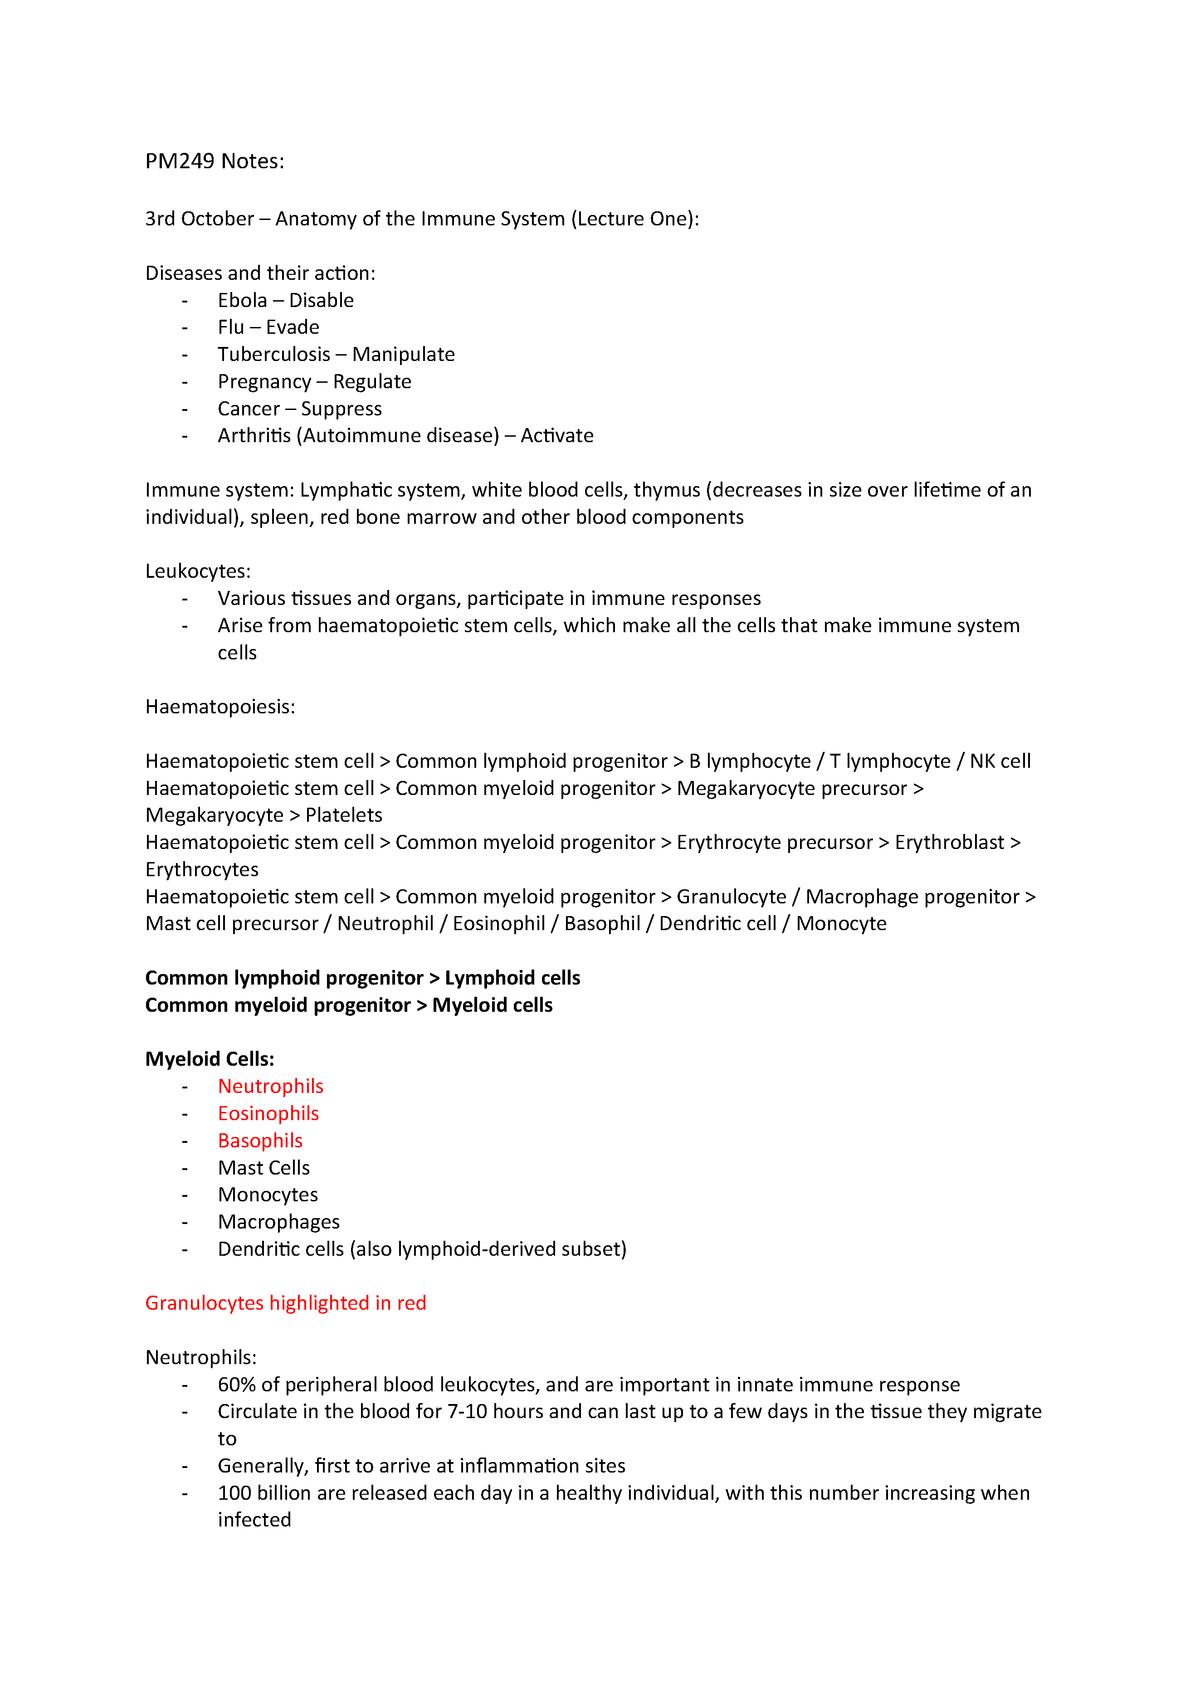 PM249 Notes - Human Immunology PM-249 - Swansea - StuDocu